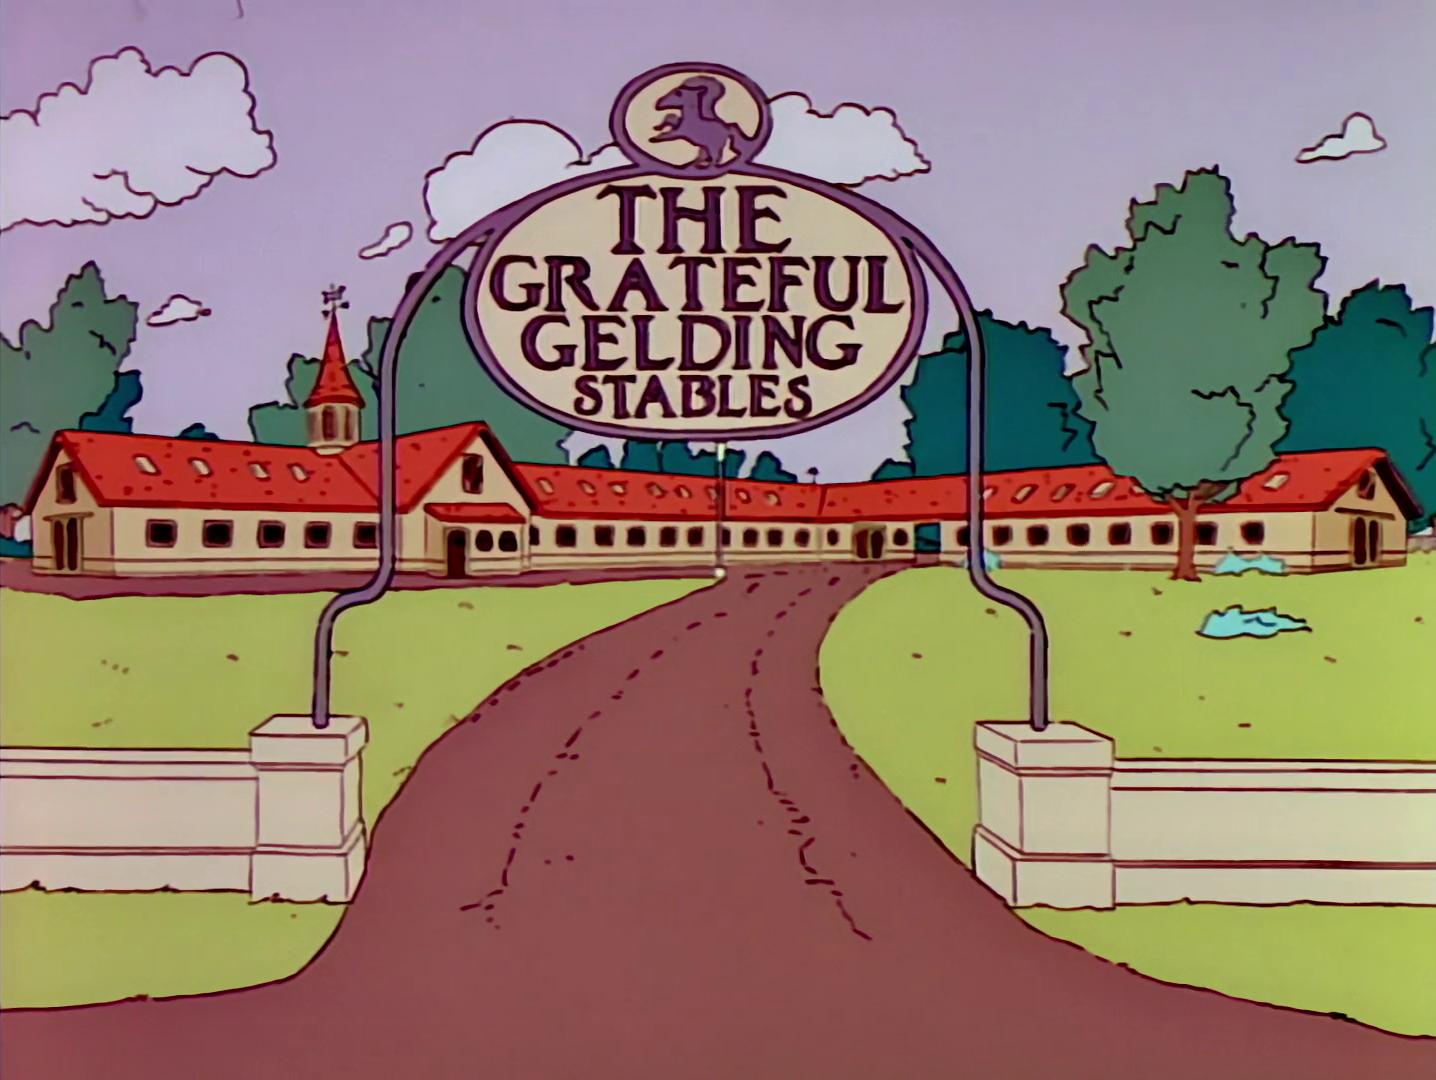 The Grateful Gelding Stables